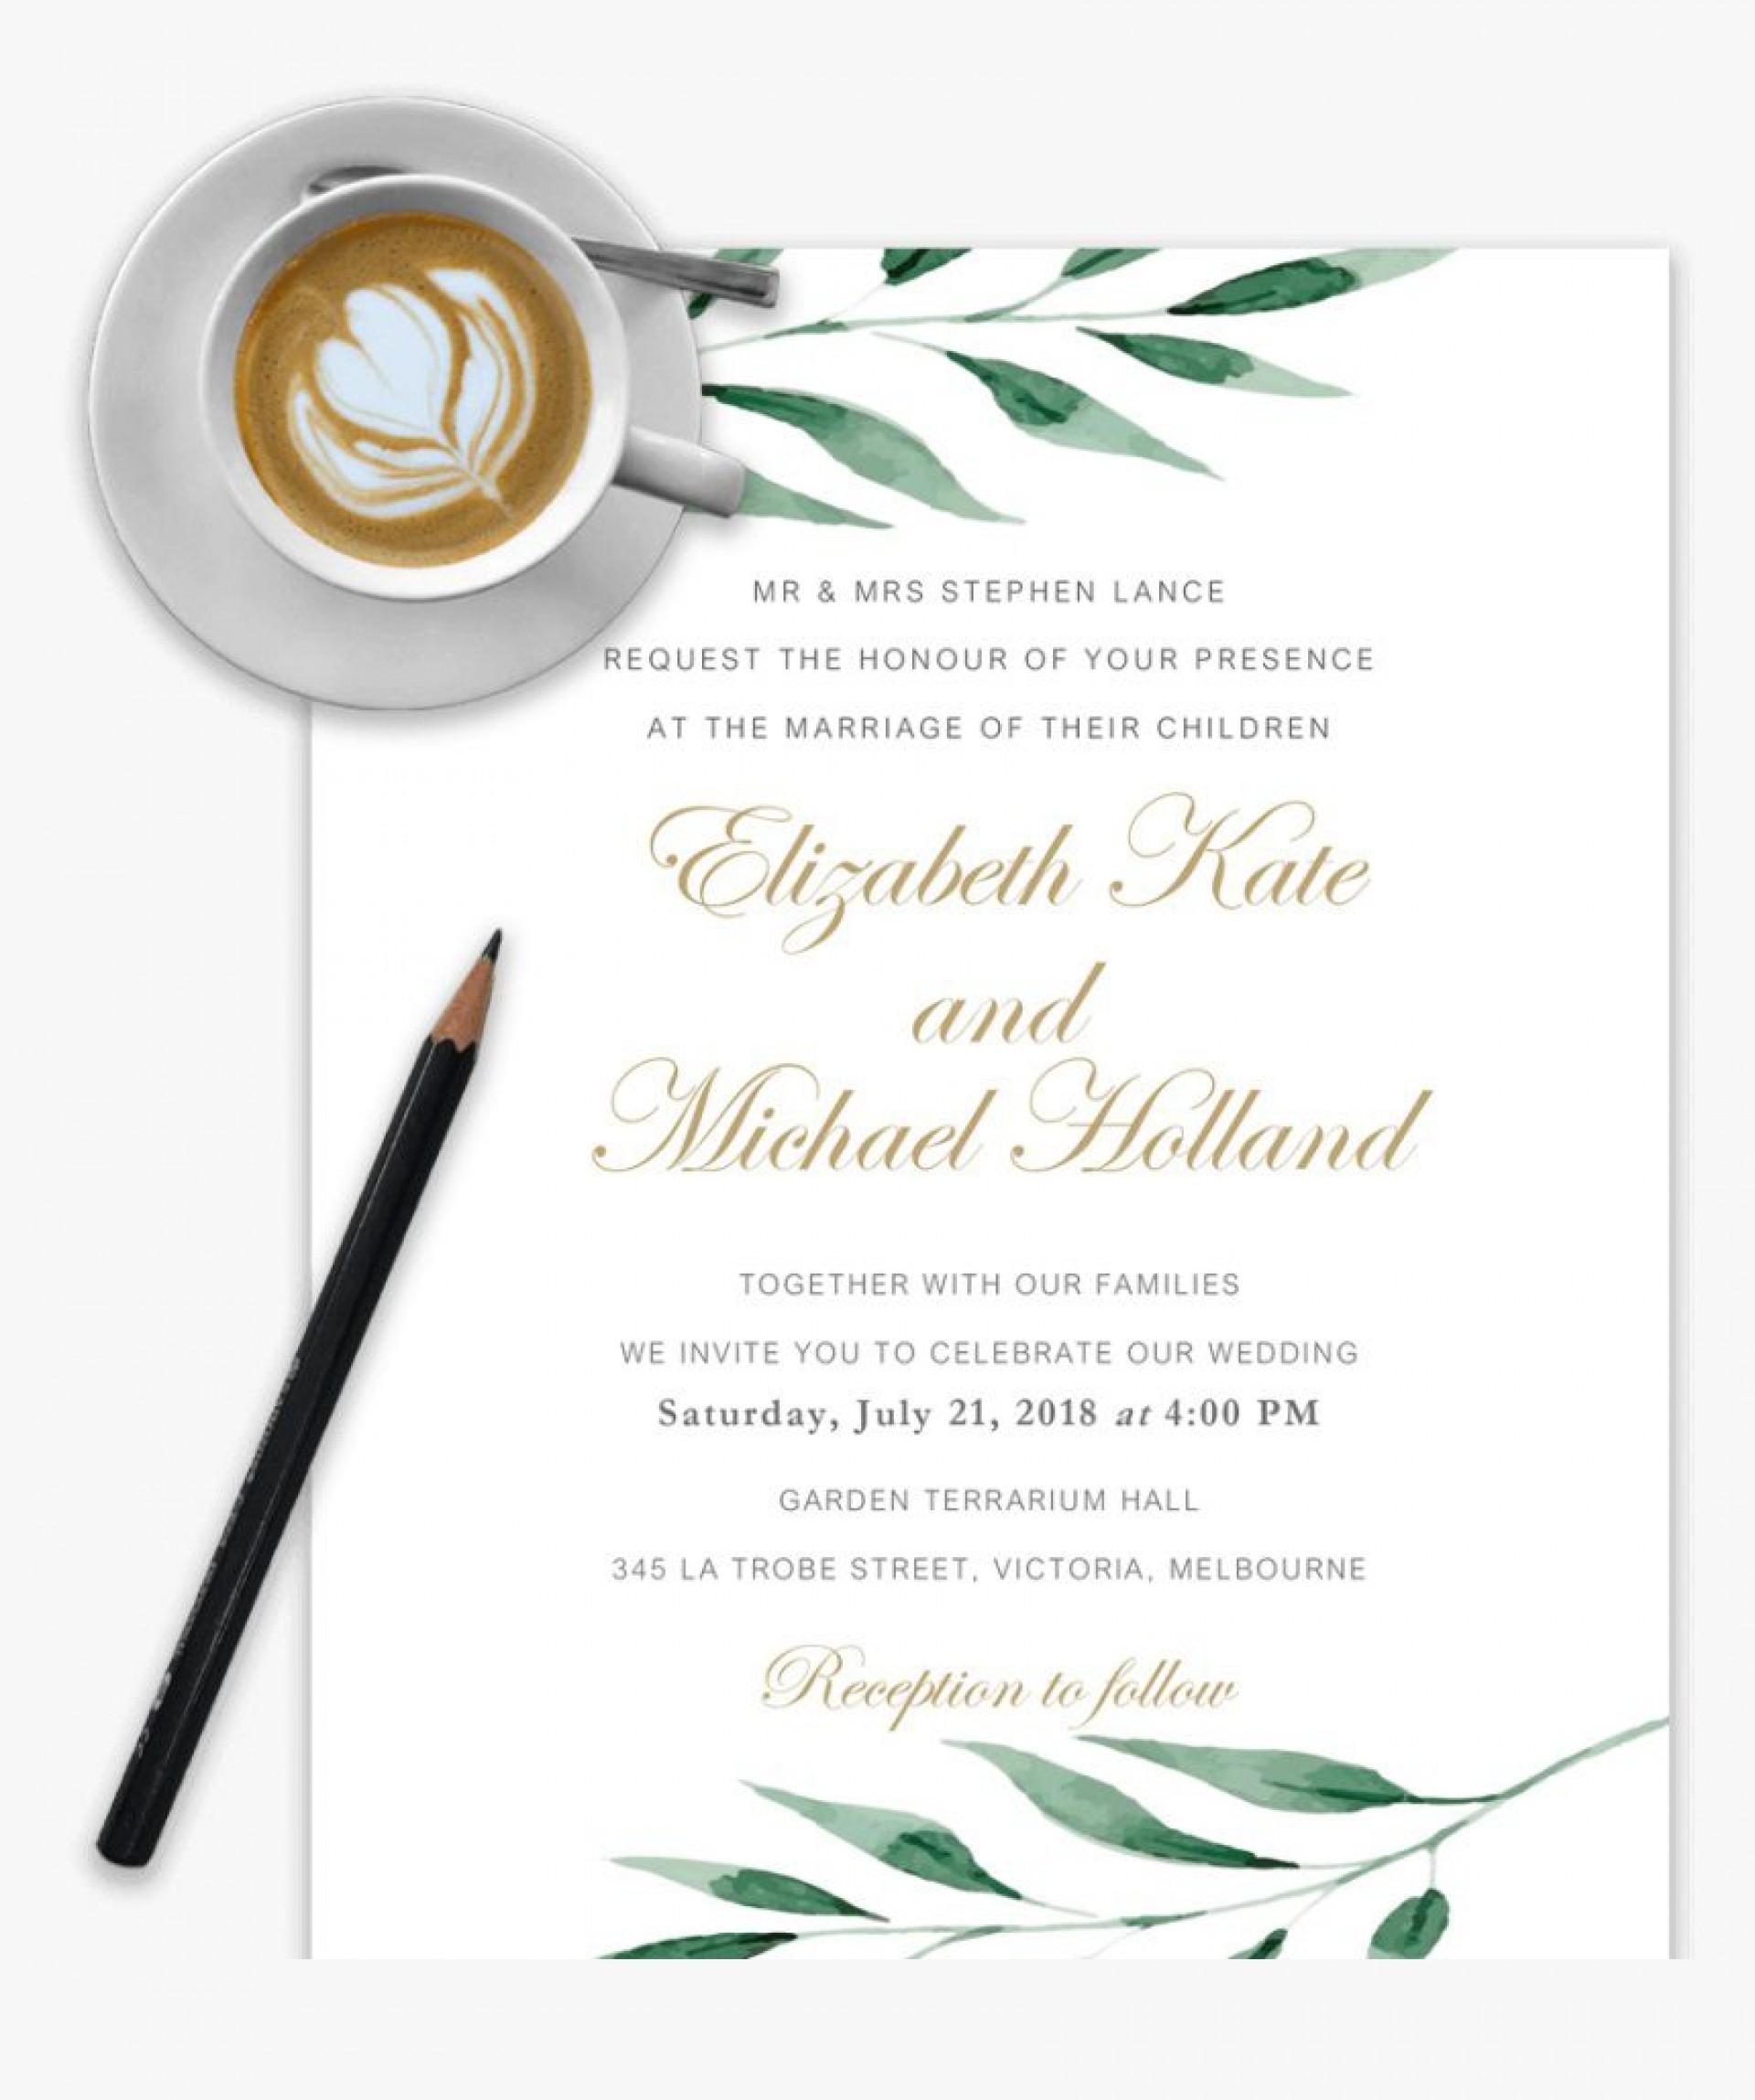 002 Fascinating Free Wedding Template For Word High Def  Invitation In Marathi Menu1920